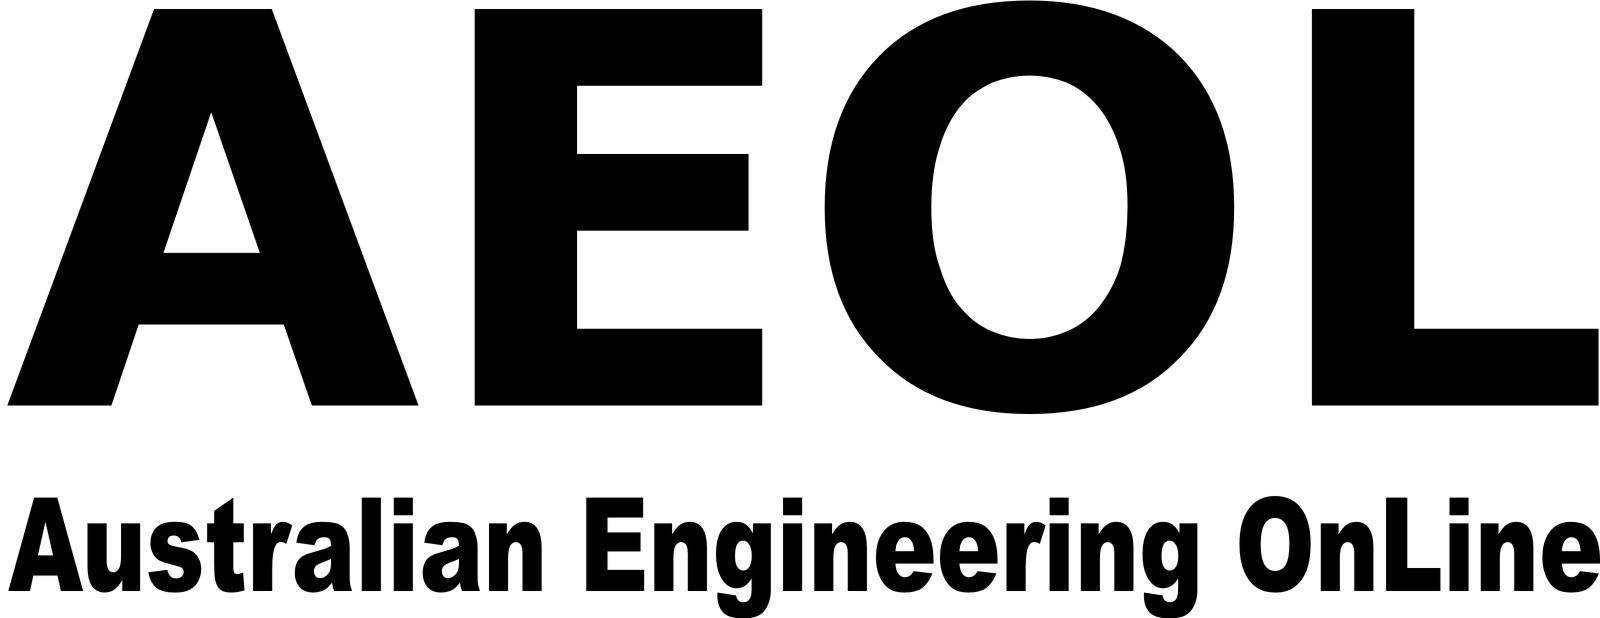 Australian Engineering OnLine logo